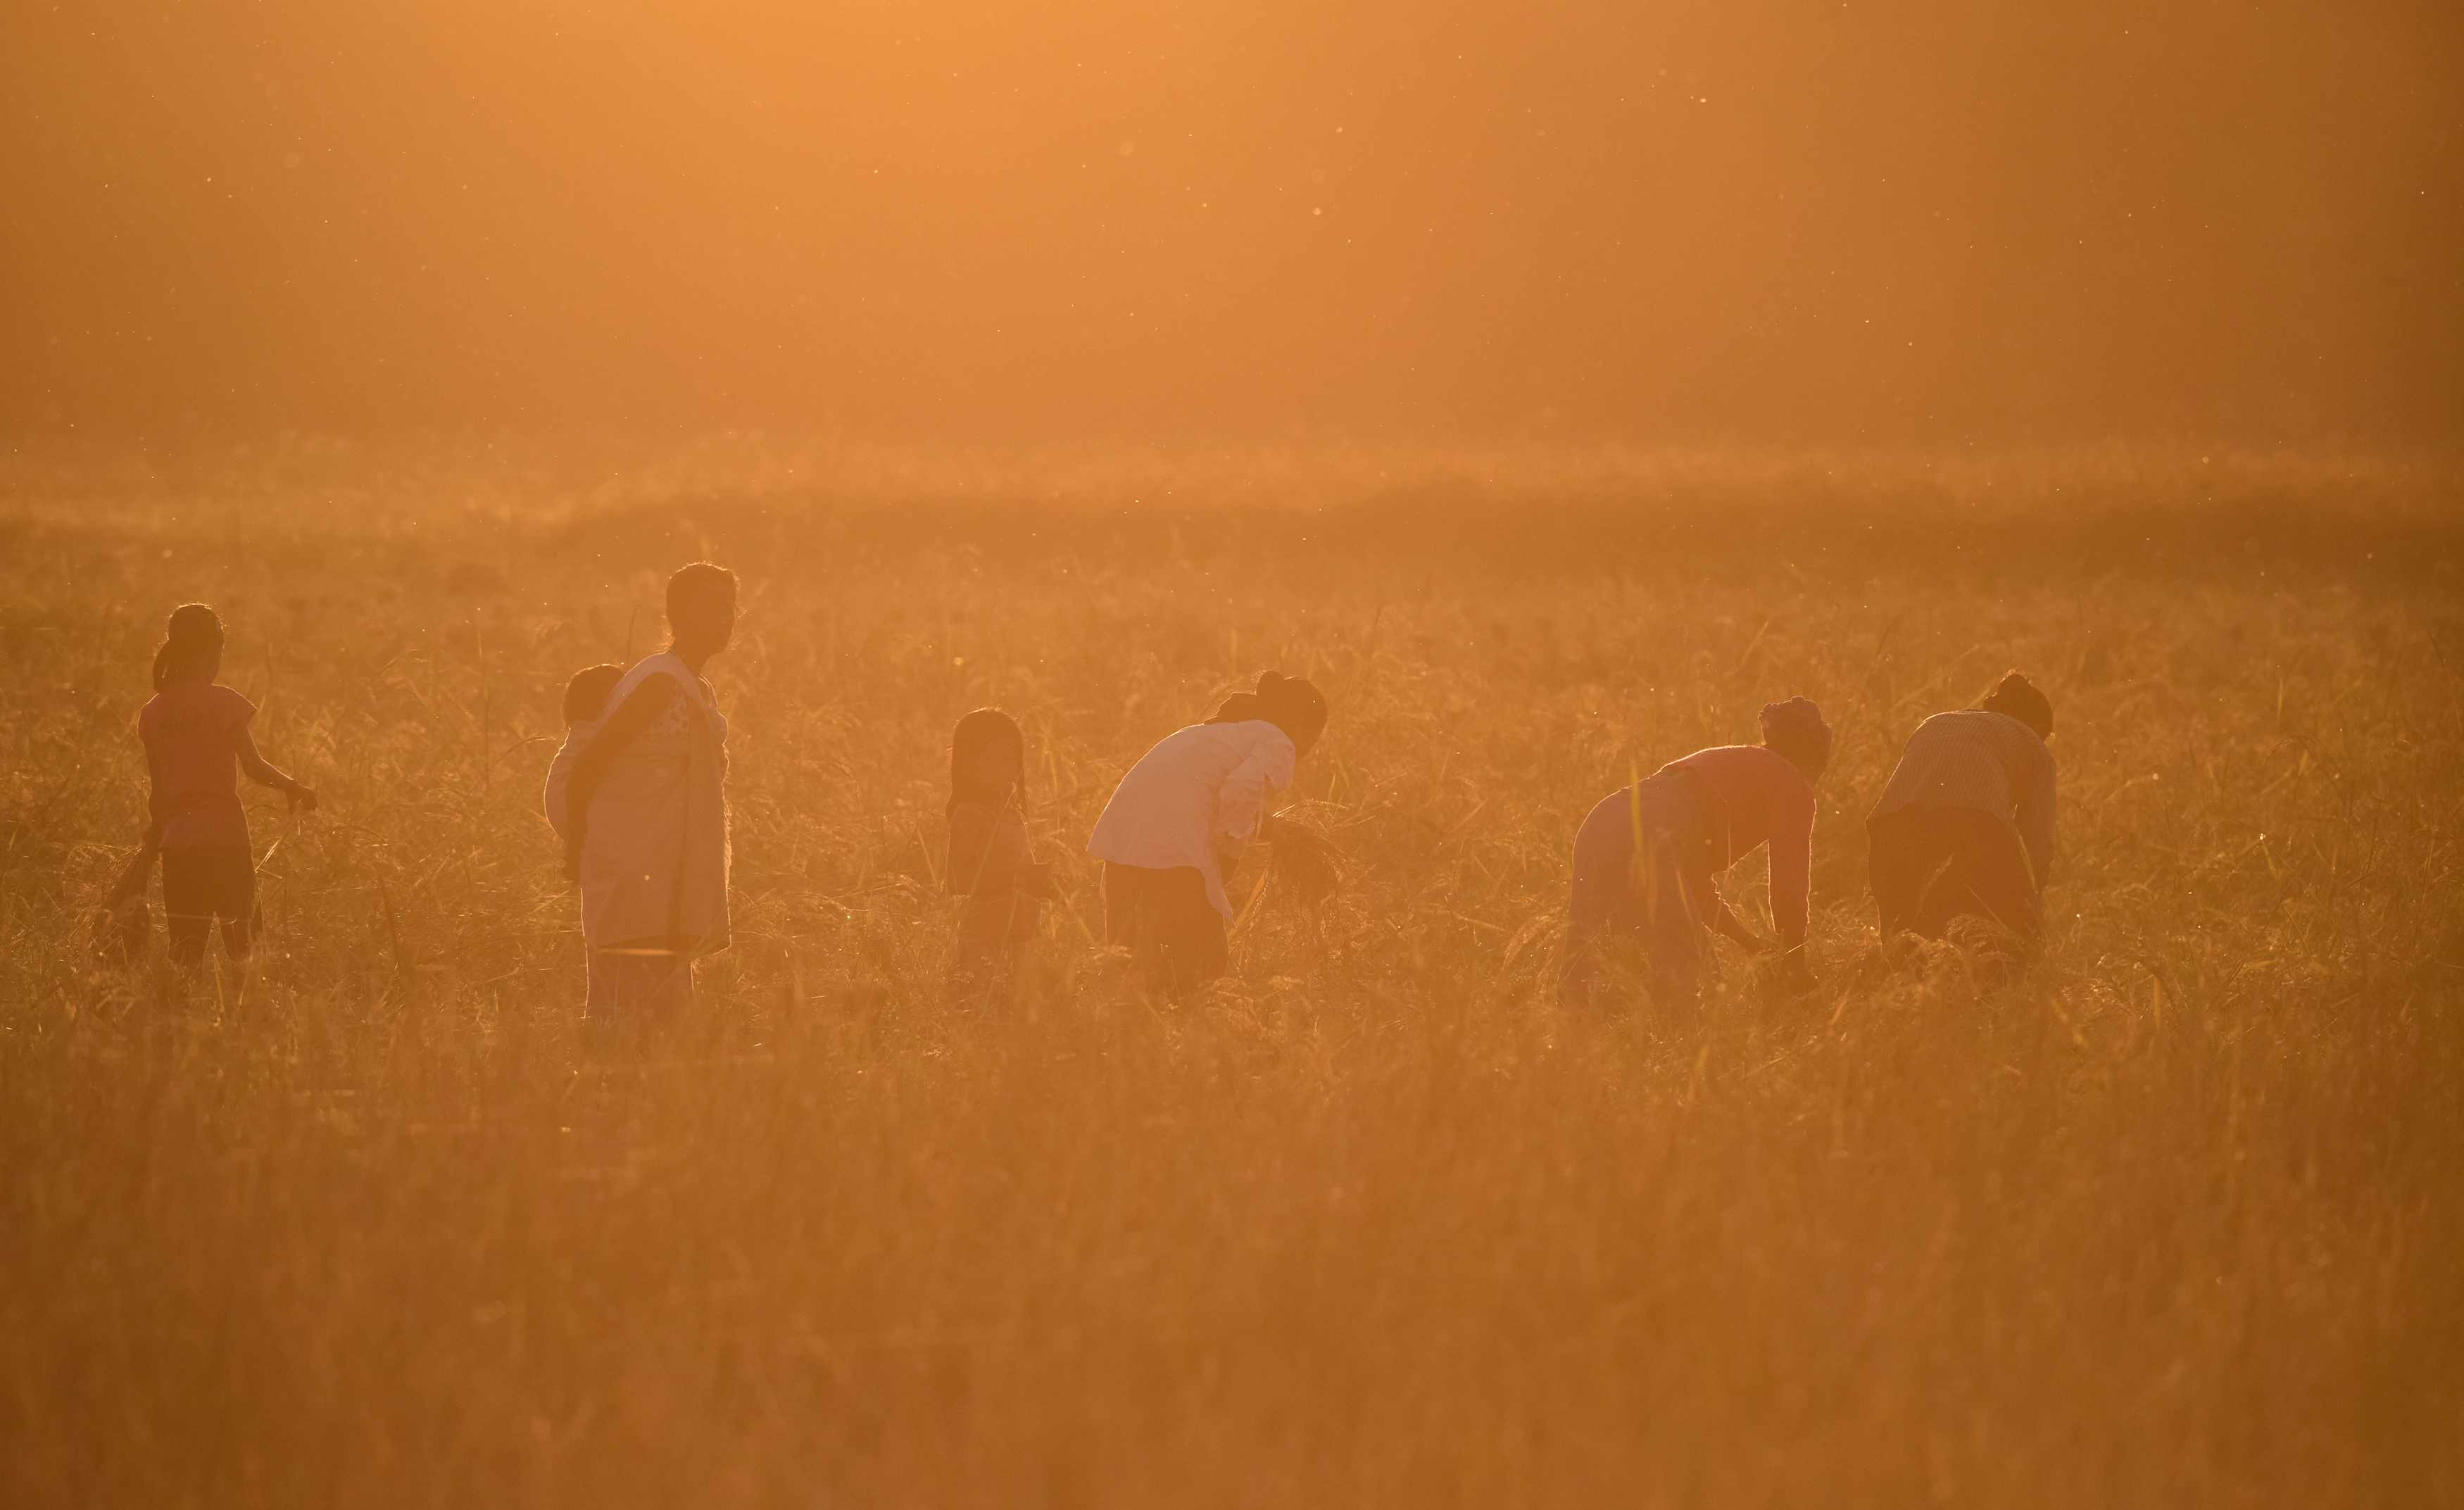 rice farmers in Assam, India